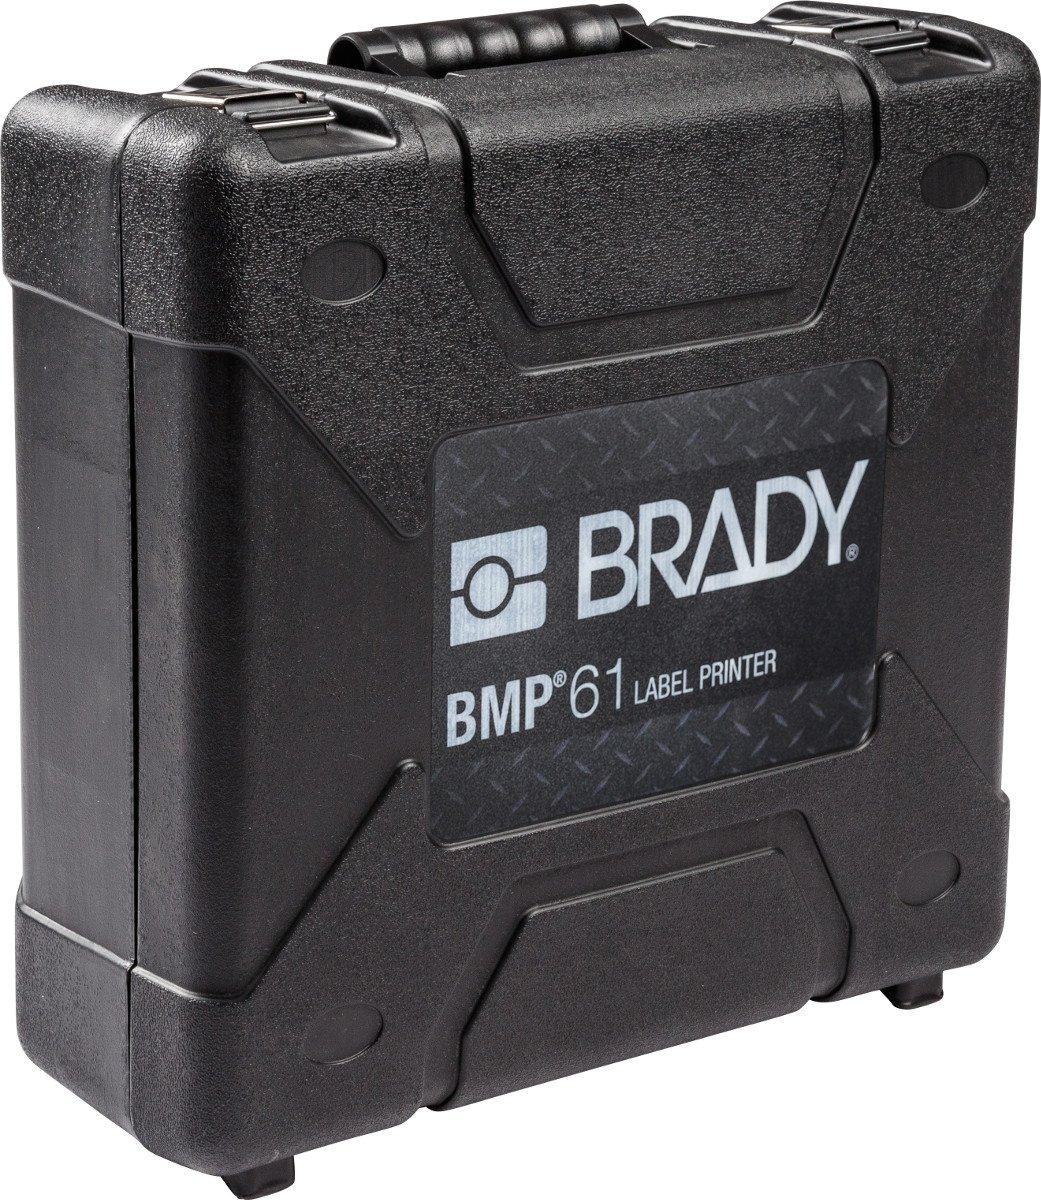 Brady BMP-HC-1 BMP61 Label Printer Accessory Hard Case, Black